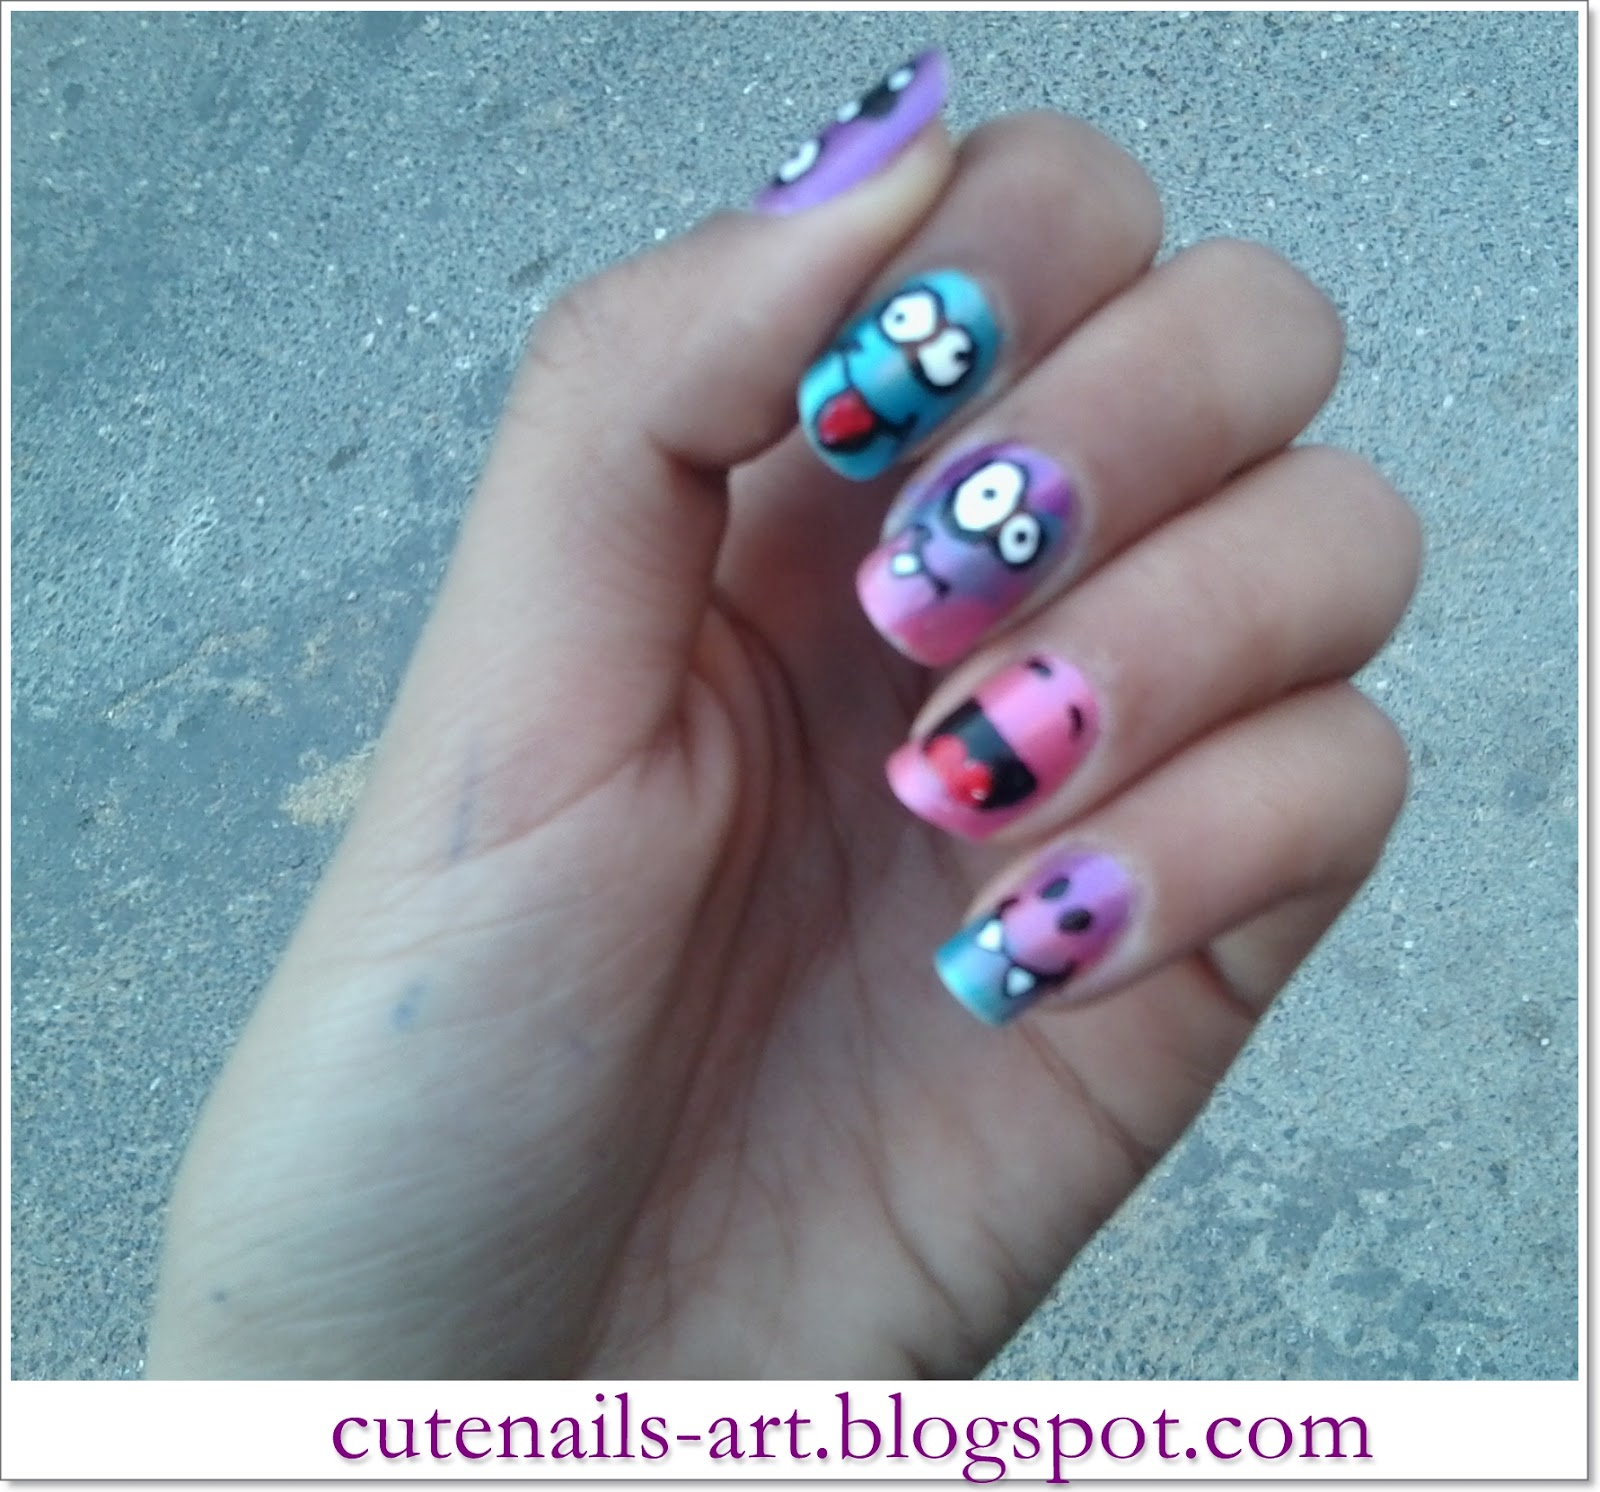 Cutenails Art Crazysmiley Faces Nail Art